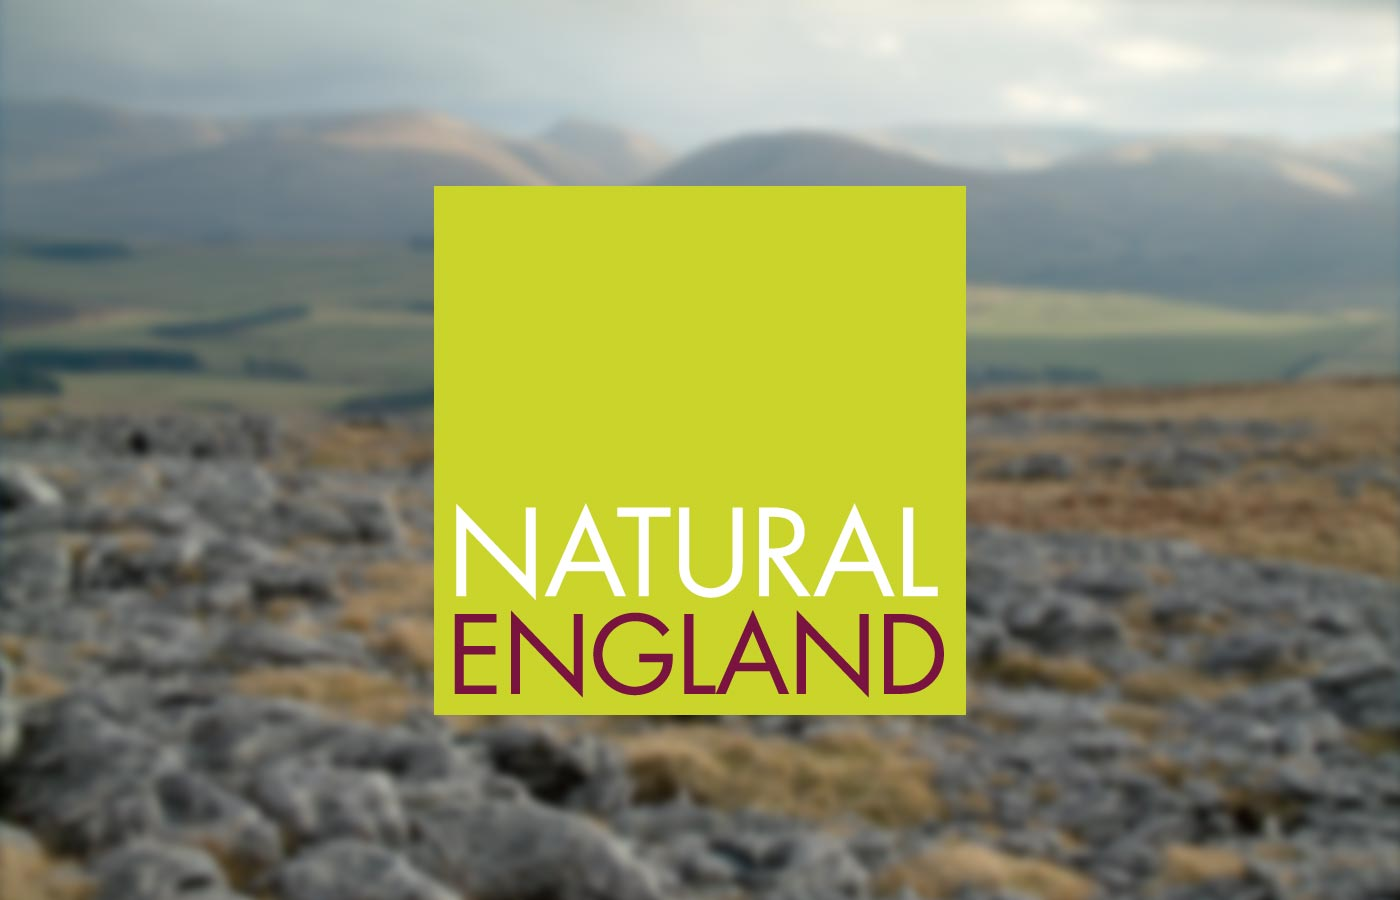 Natural England Poster Campaign Design